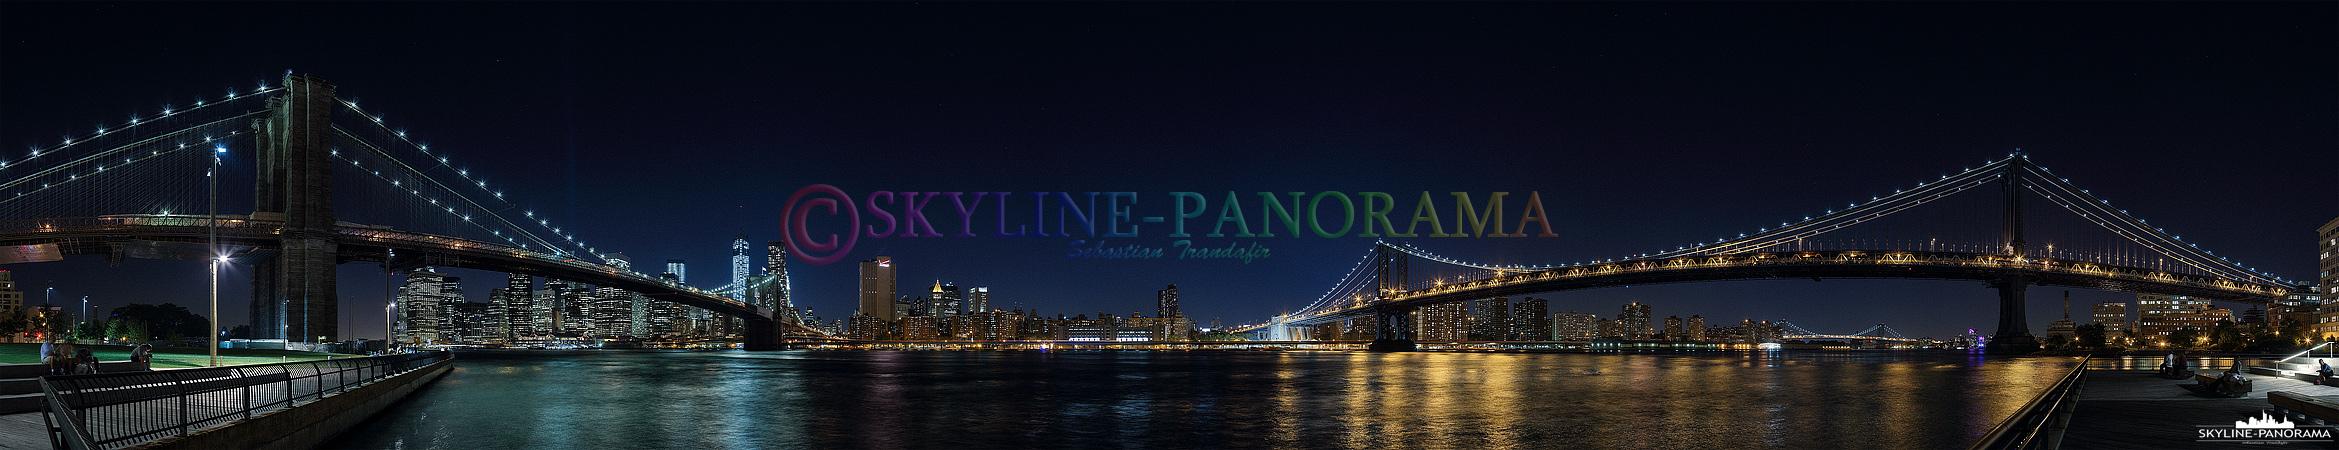 Skyline Manhattan - New York